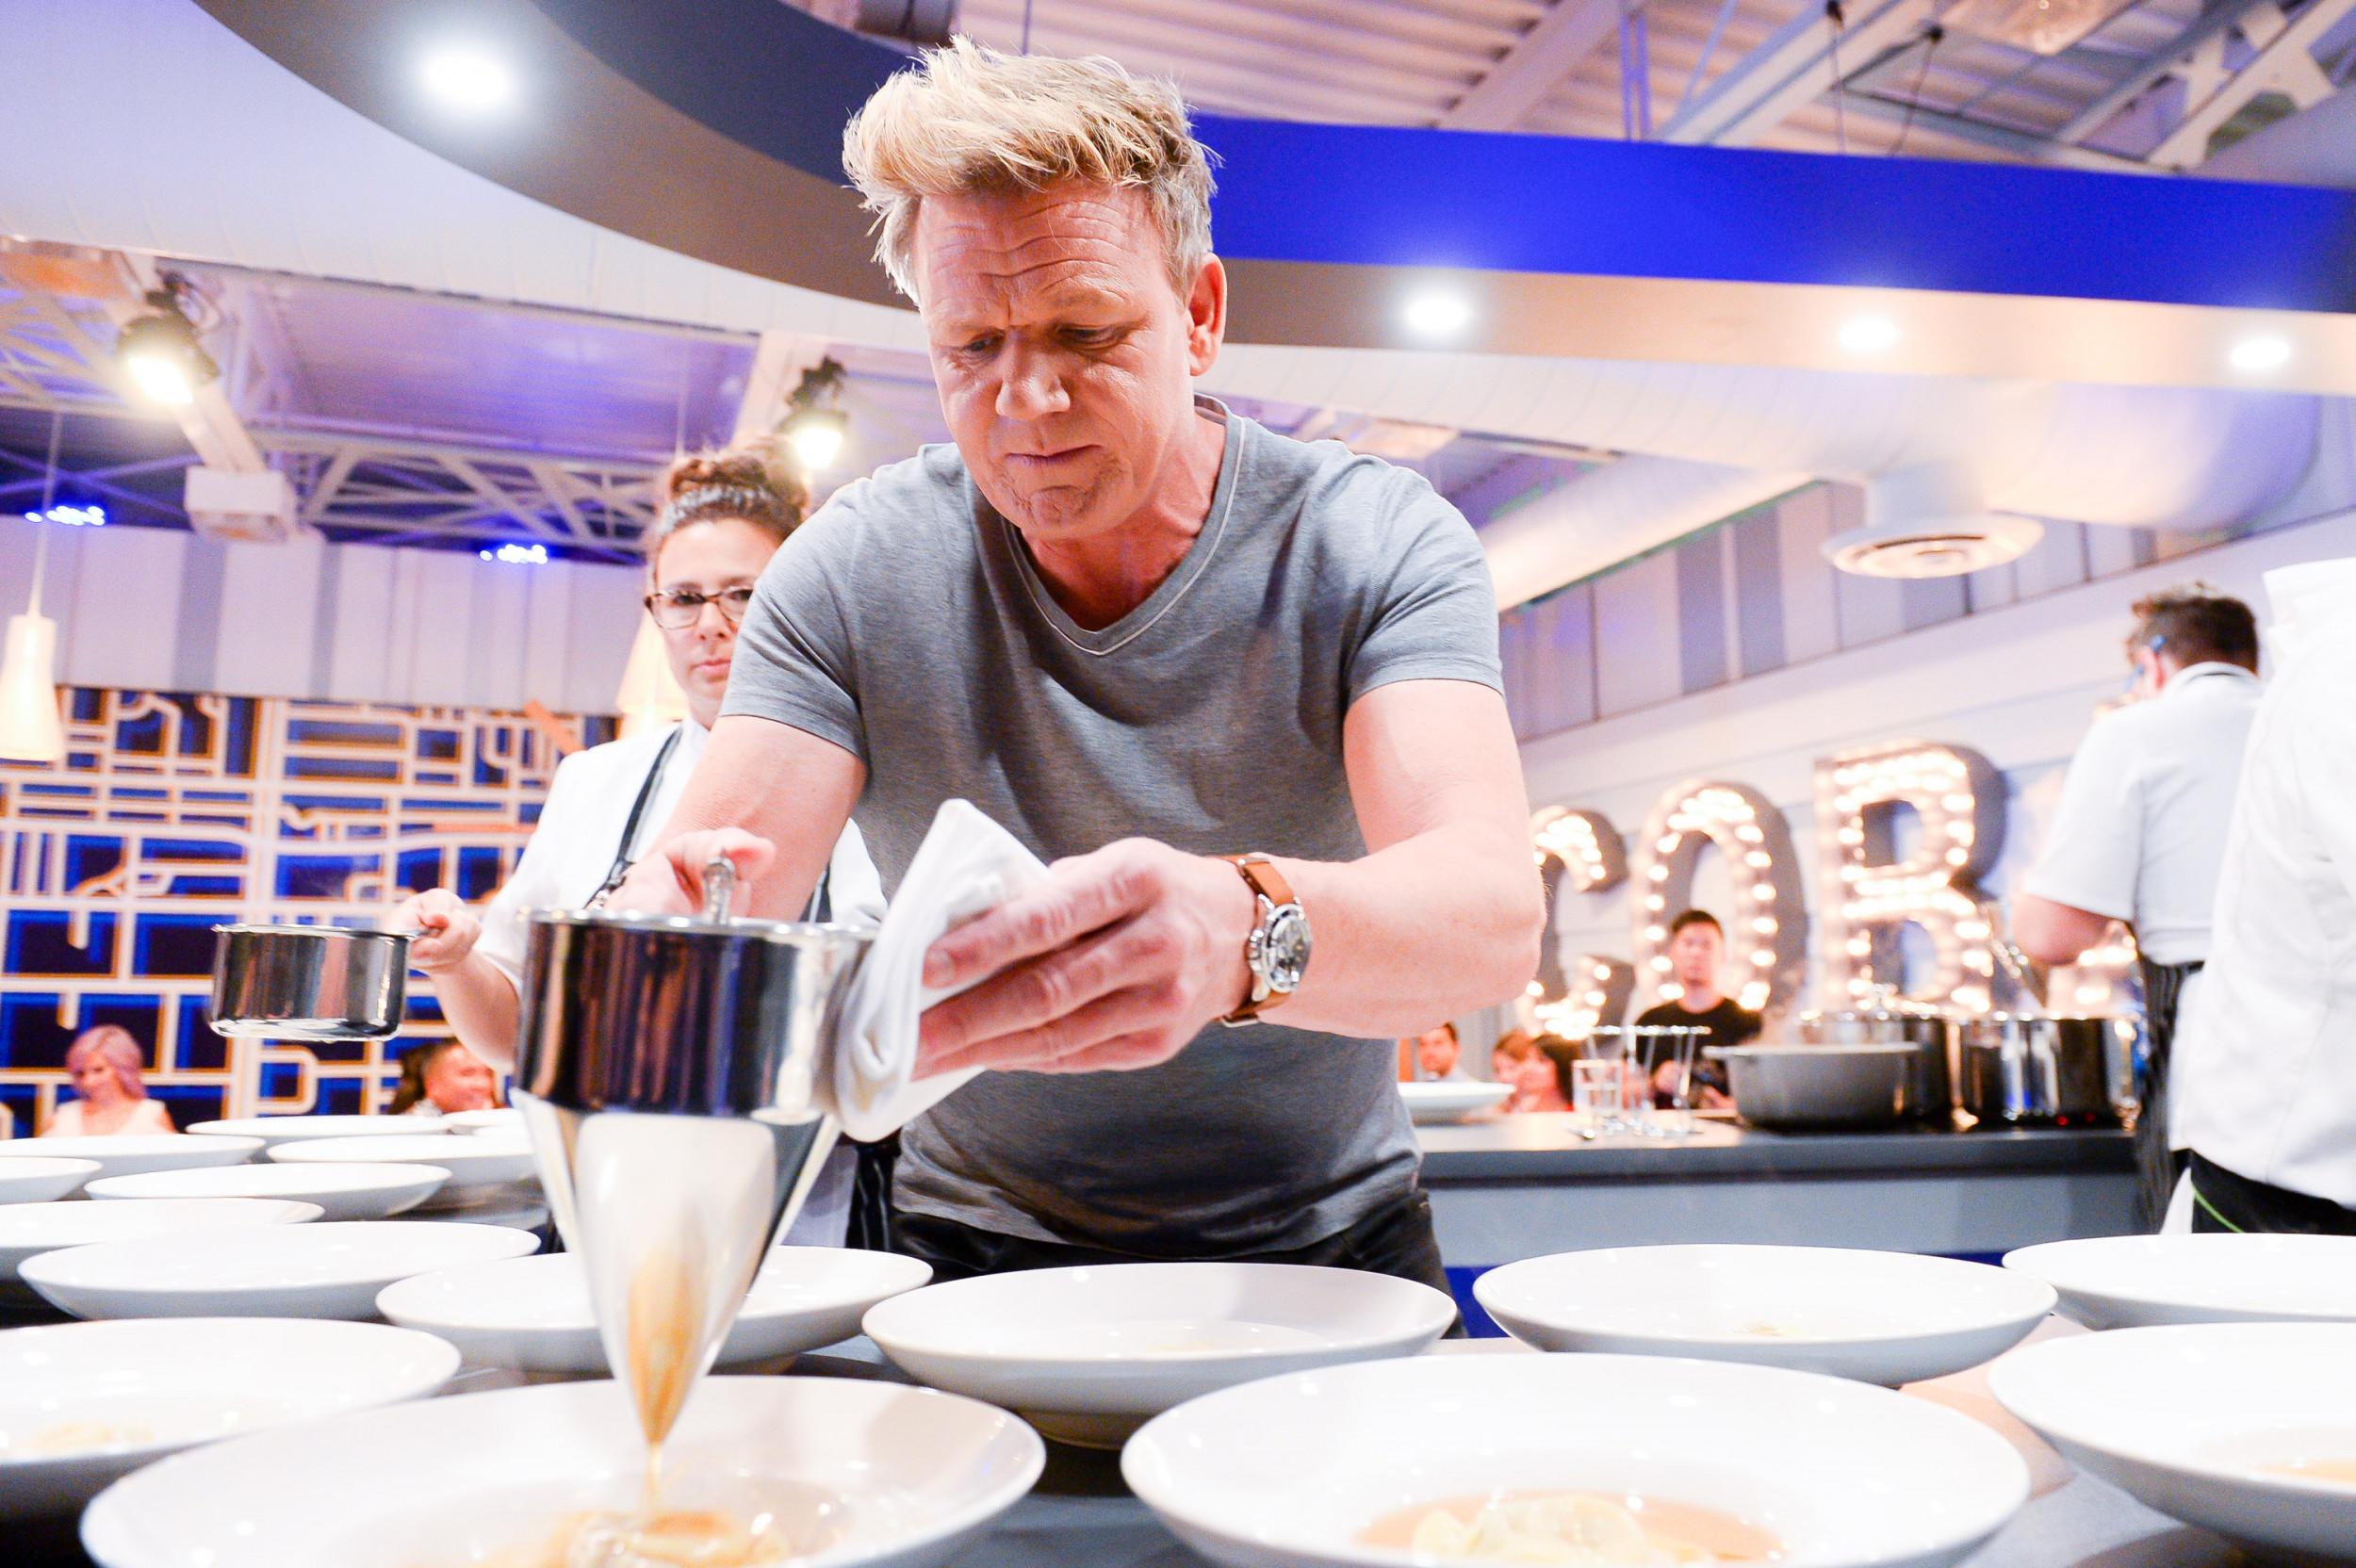 Gordon Ramsay Steak: Kansas City Restaurant Menu, Details as TV Chef Opens First Steakhouse in Midwest